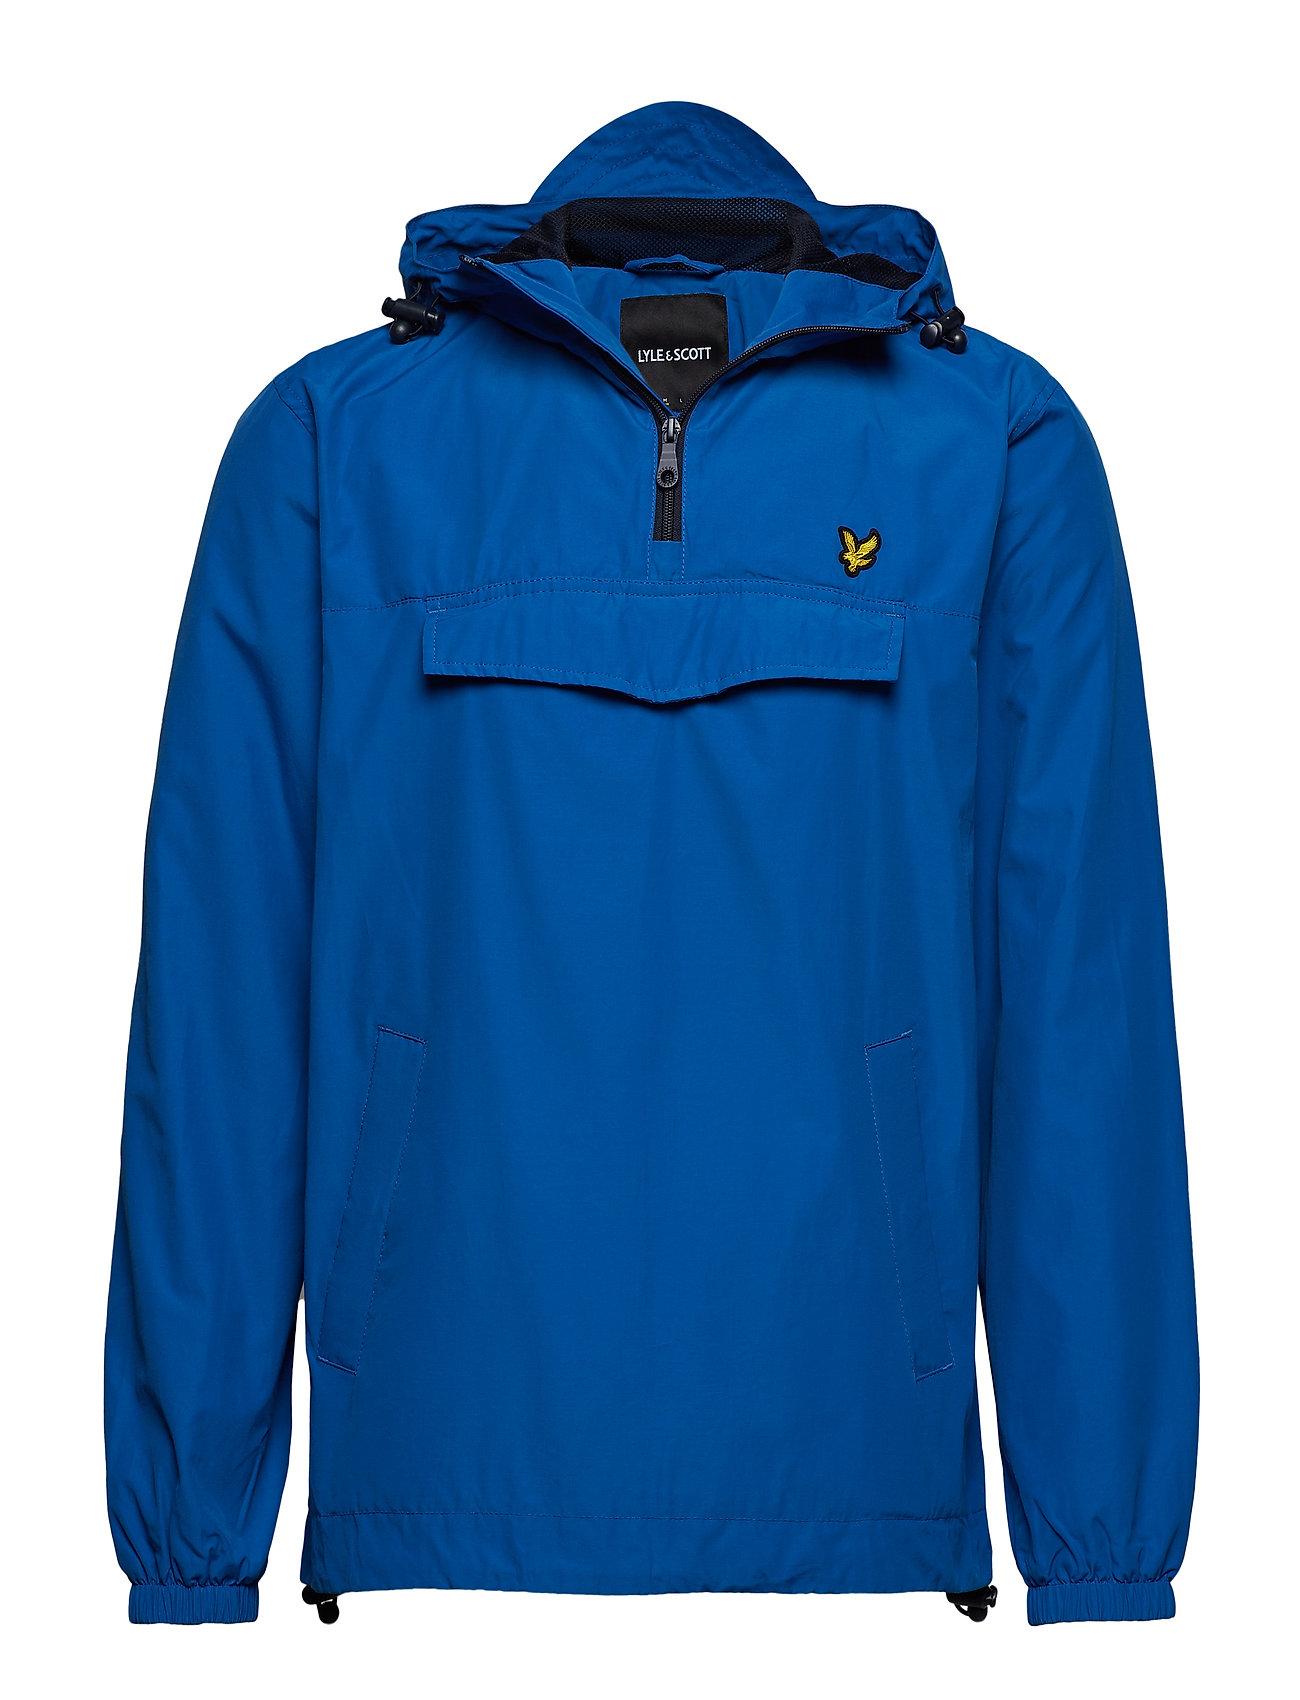 Lyle & Scott Overhead Jacket - LAKE BLUE